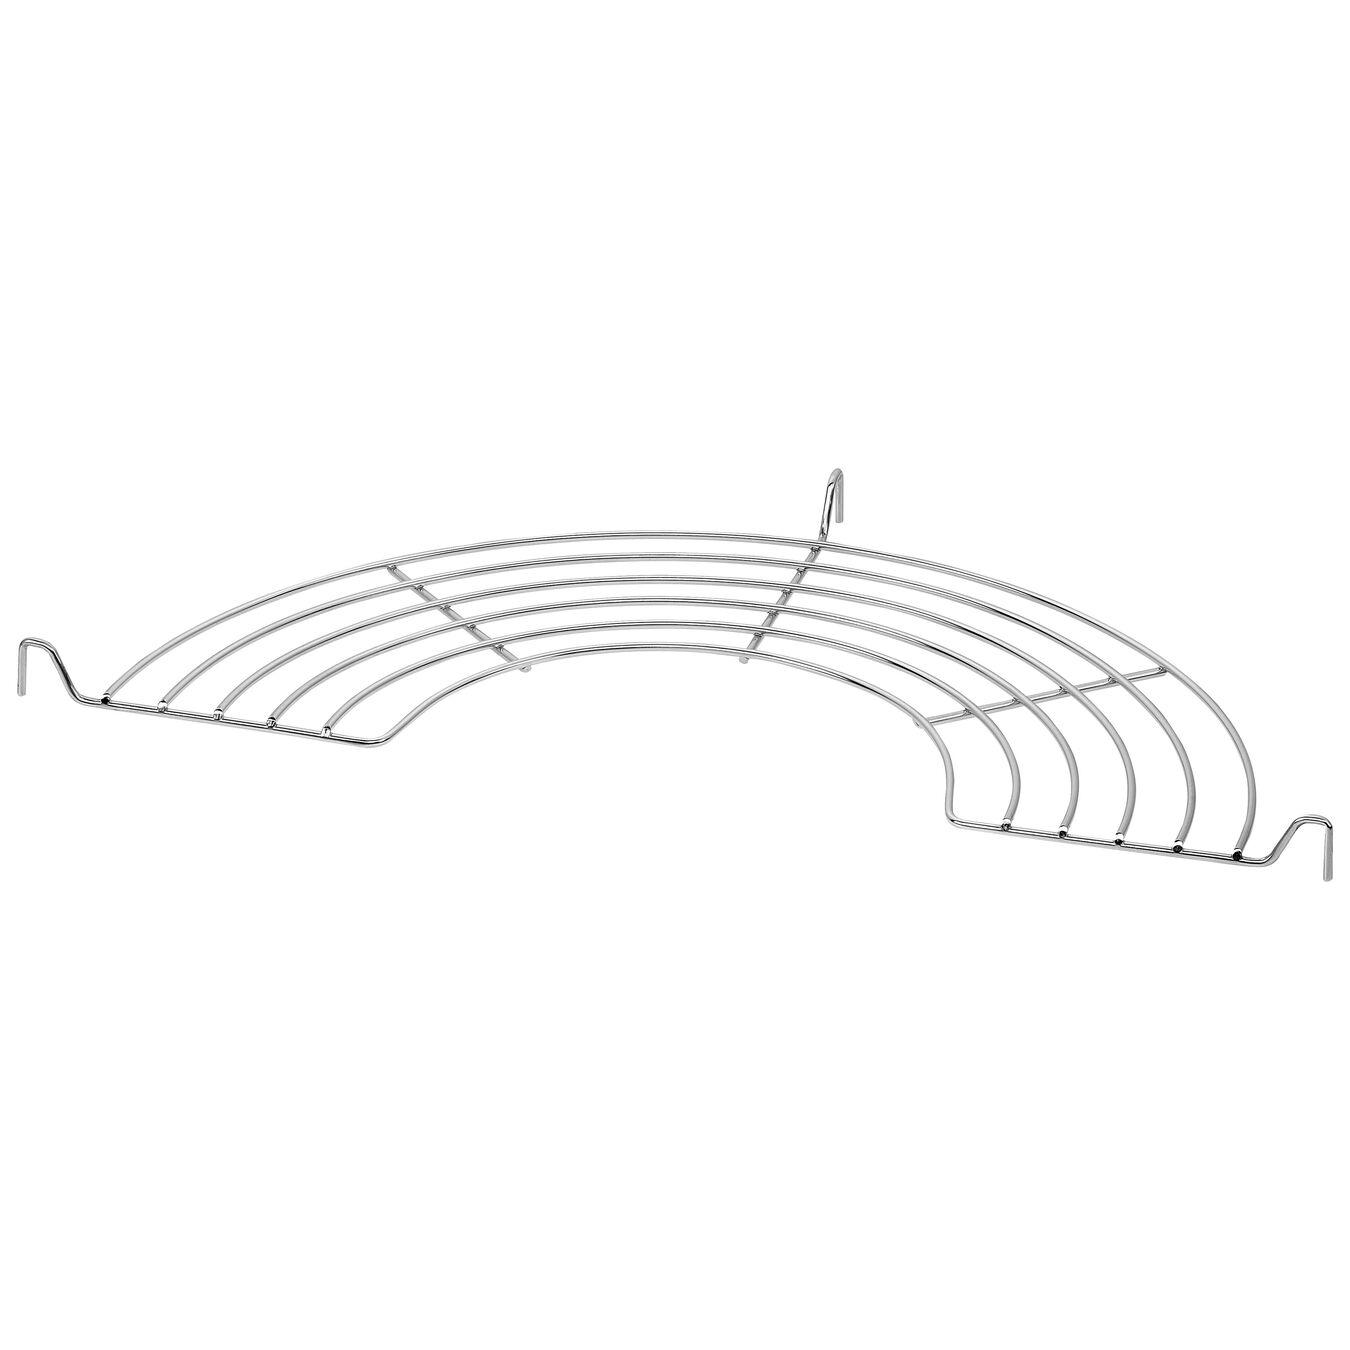 Wok 32 cm, 18/10 Edelstahl,,large 3